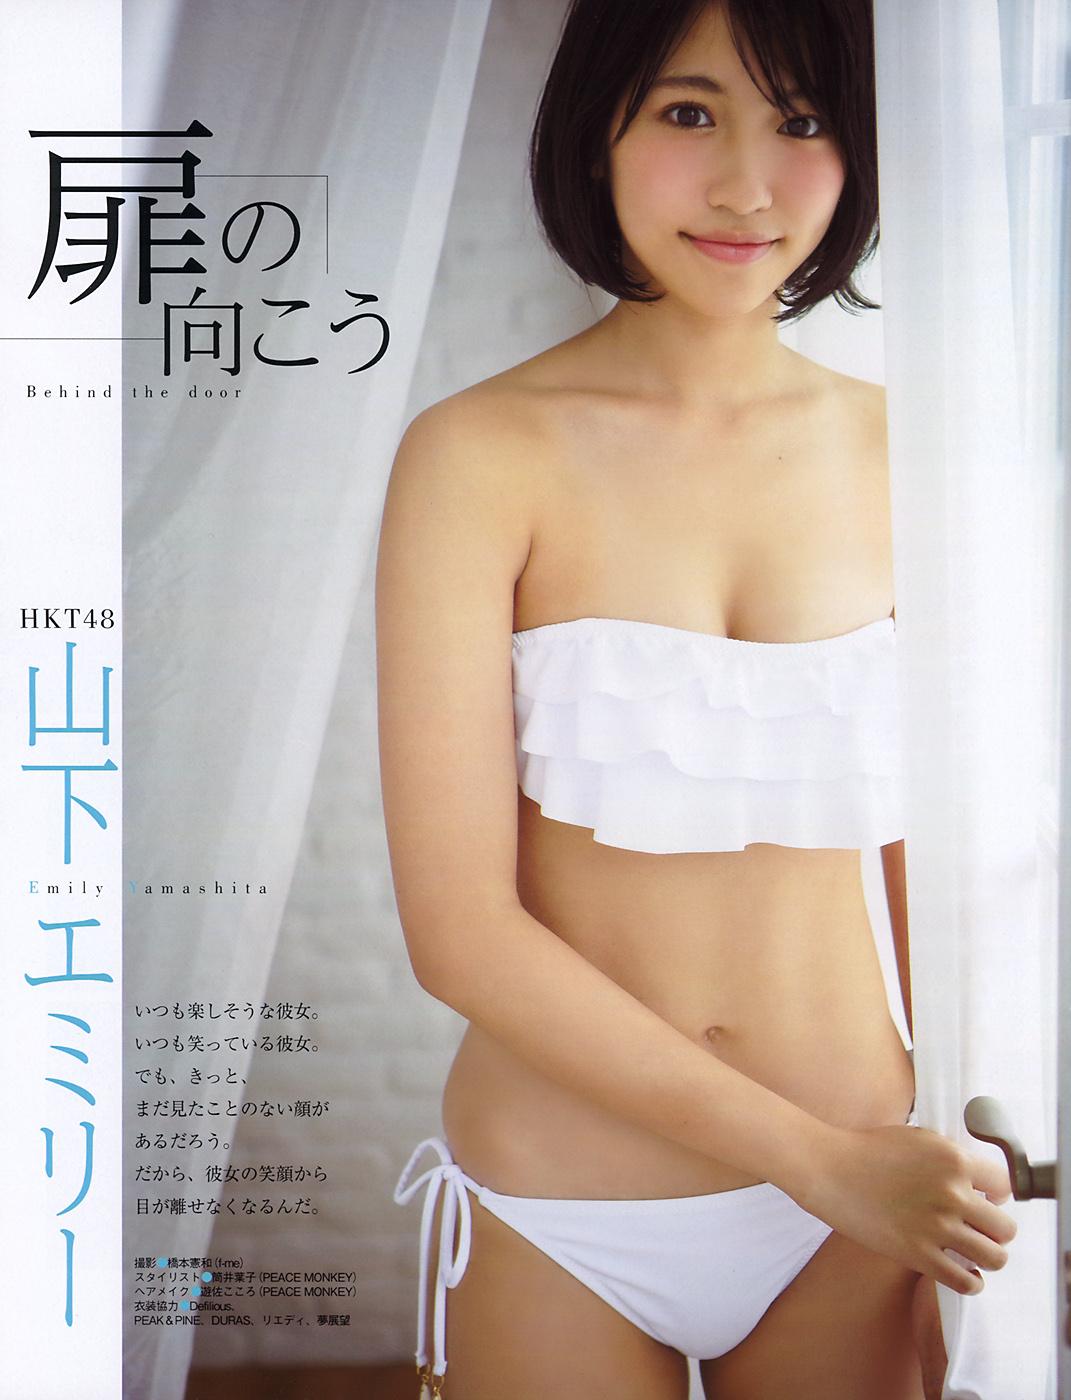 Yamashita Emily 山下 エミリー HKT48, Ex-Taishu Magazine No.01 2016 Gravure